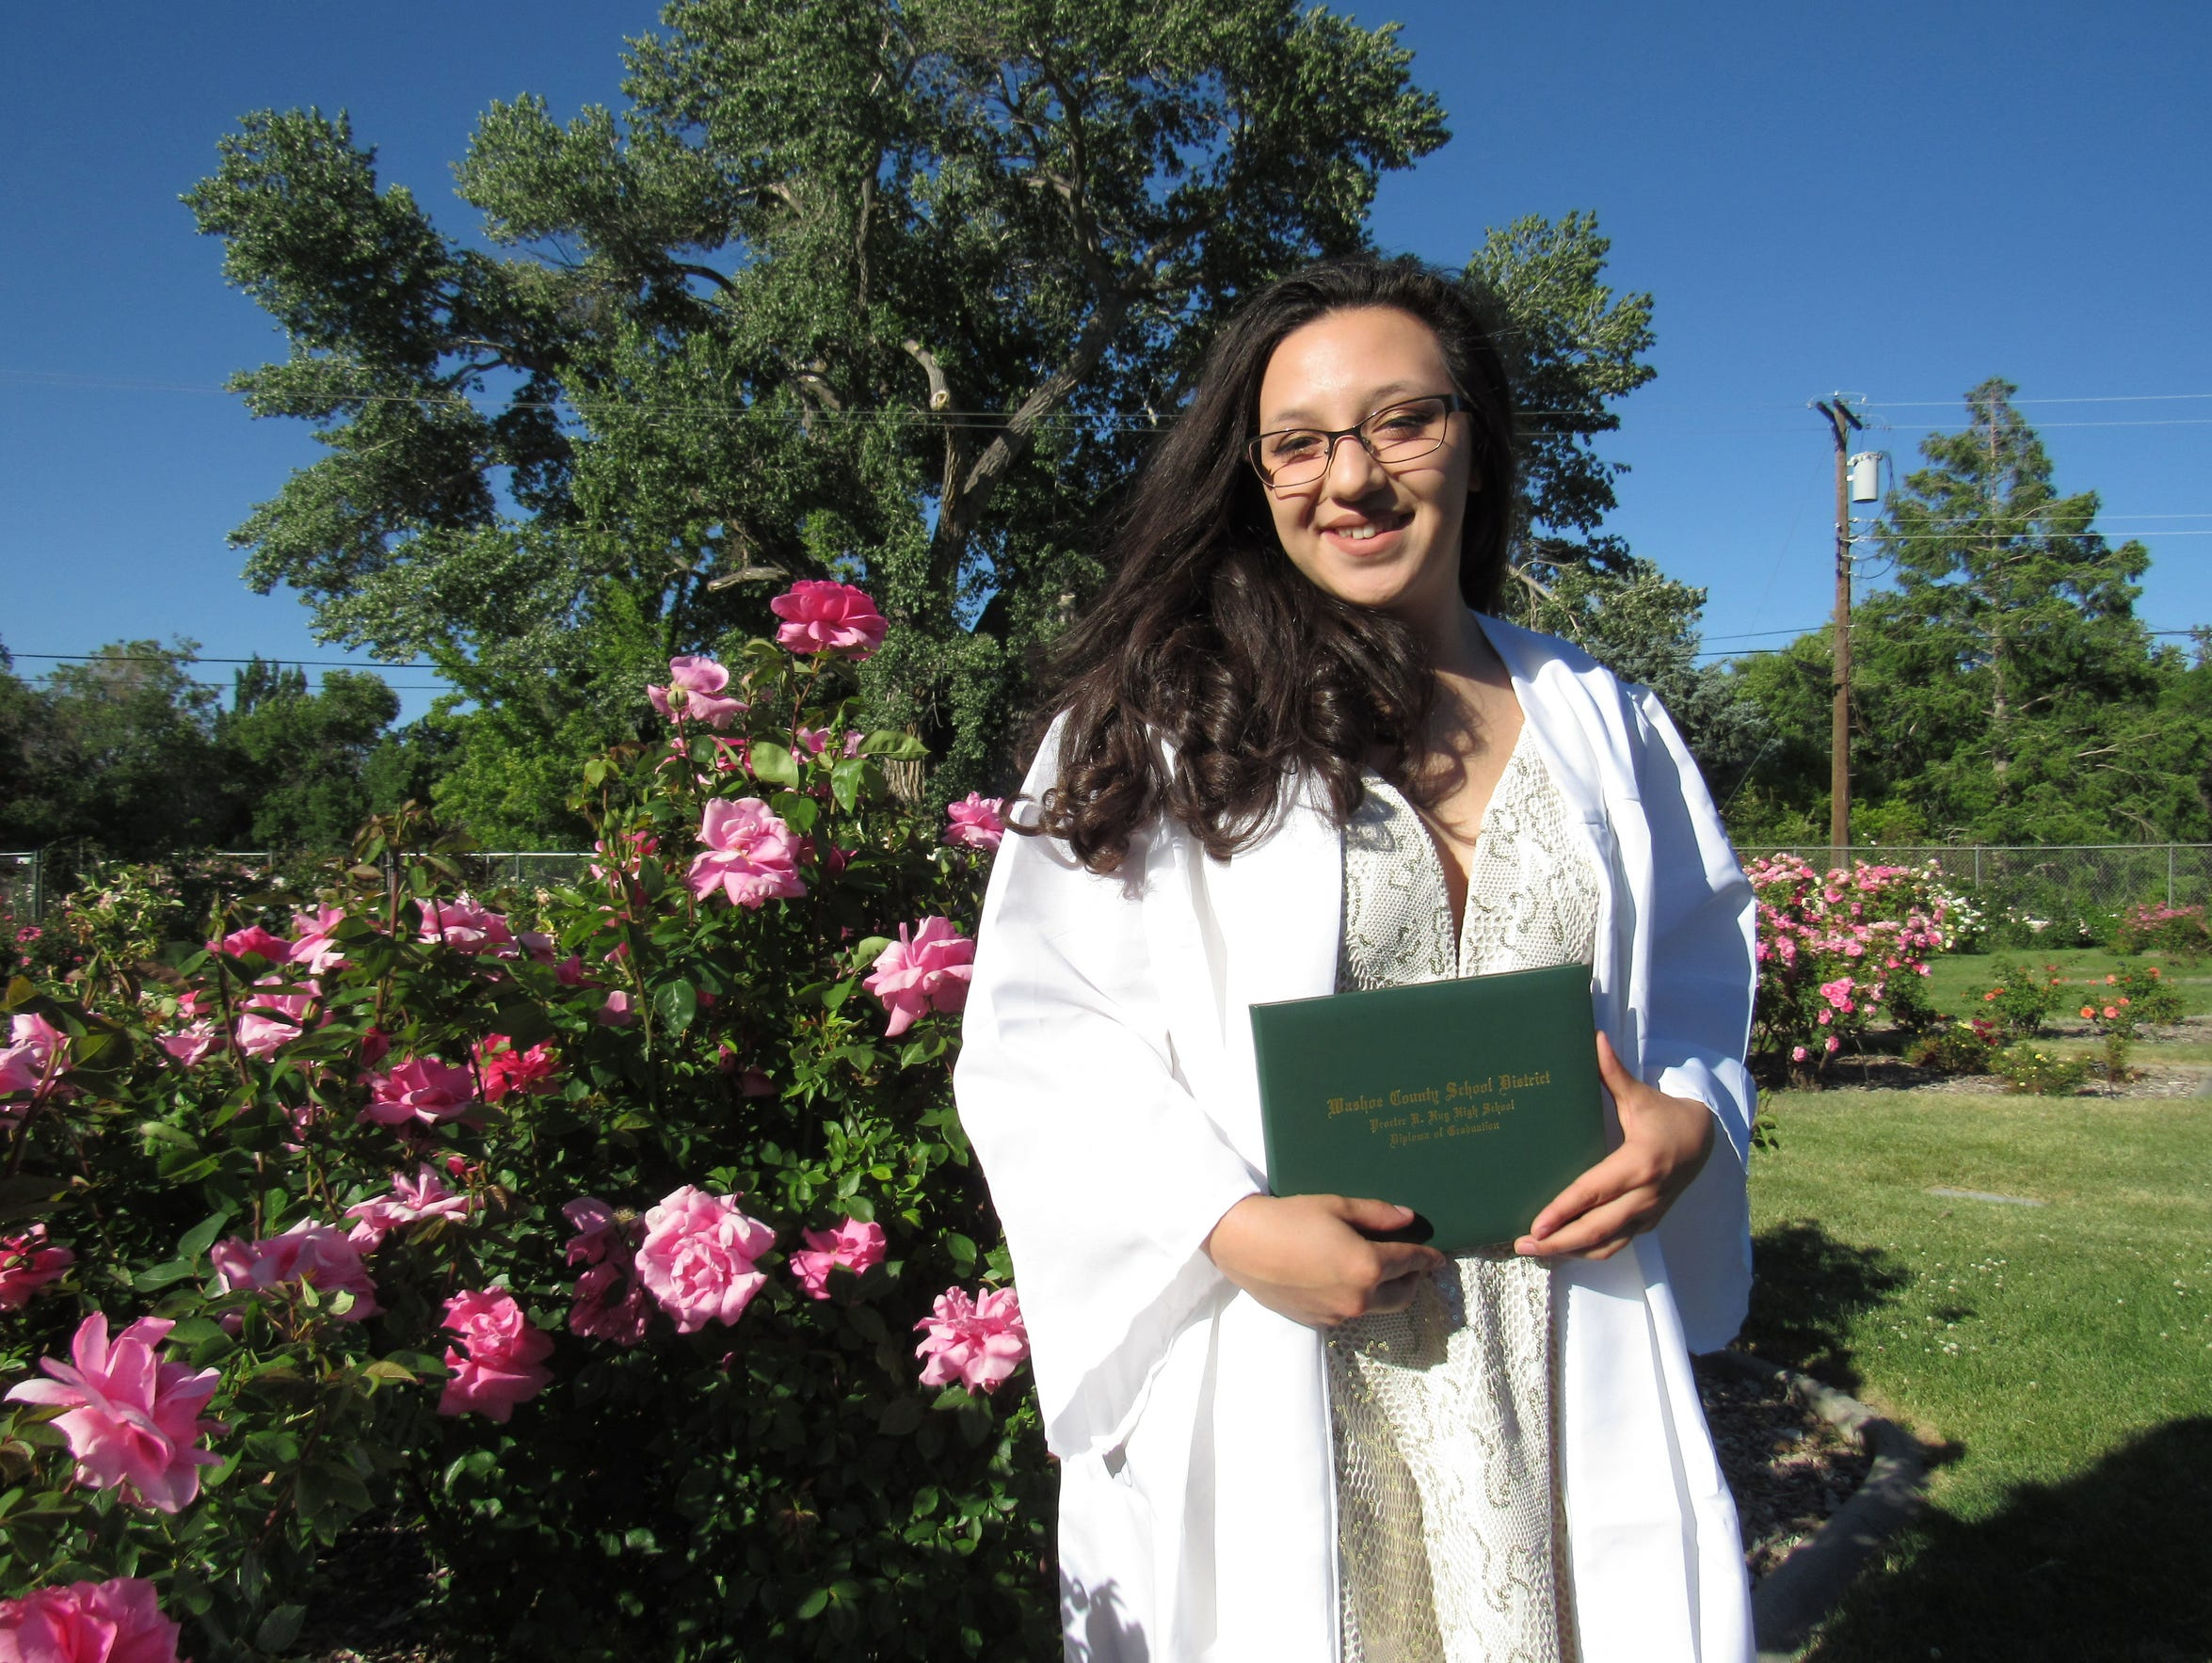 Jocelyn Najera will graduate from Hug High School as